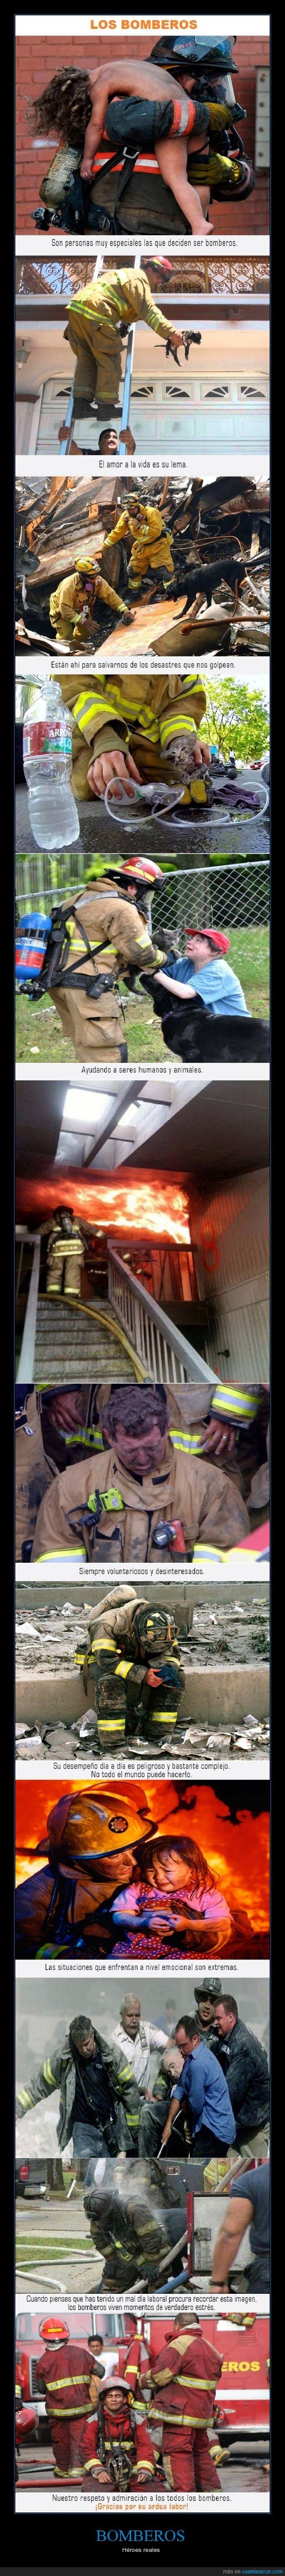 bomberos,hazaña,héroes,proeza,reales